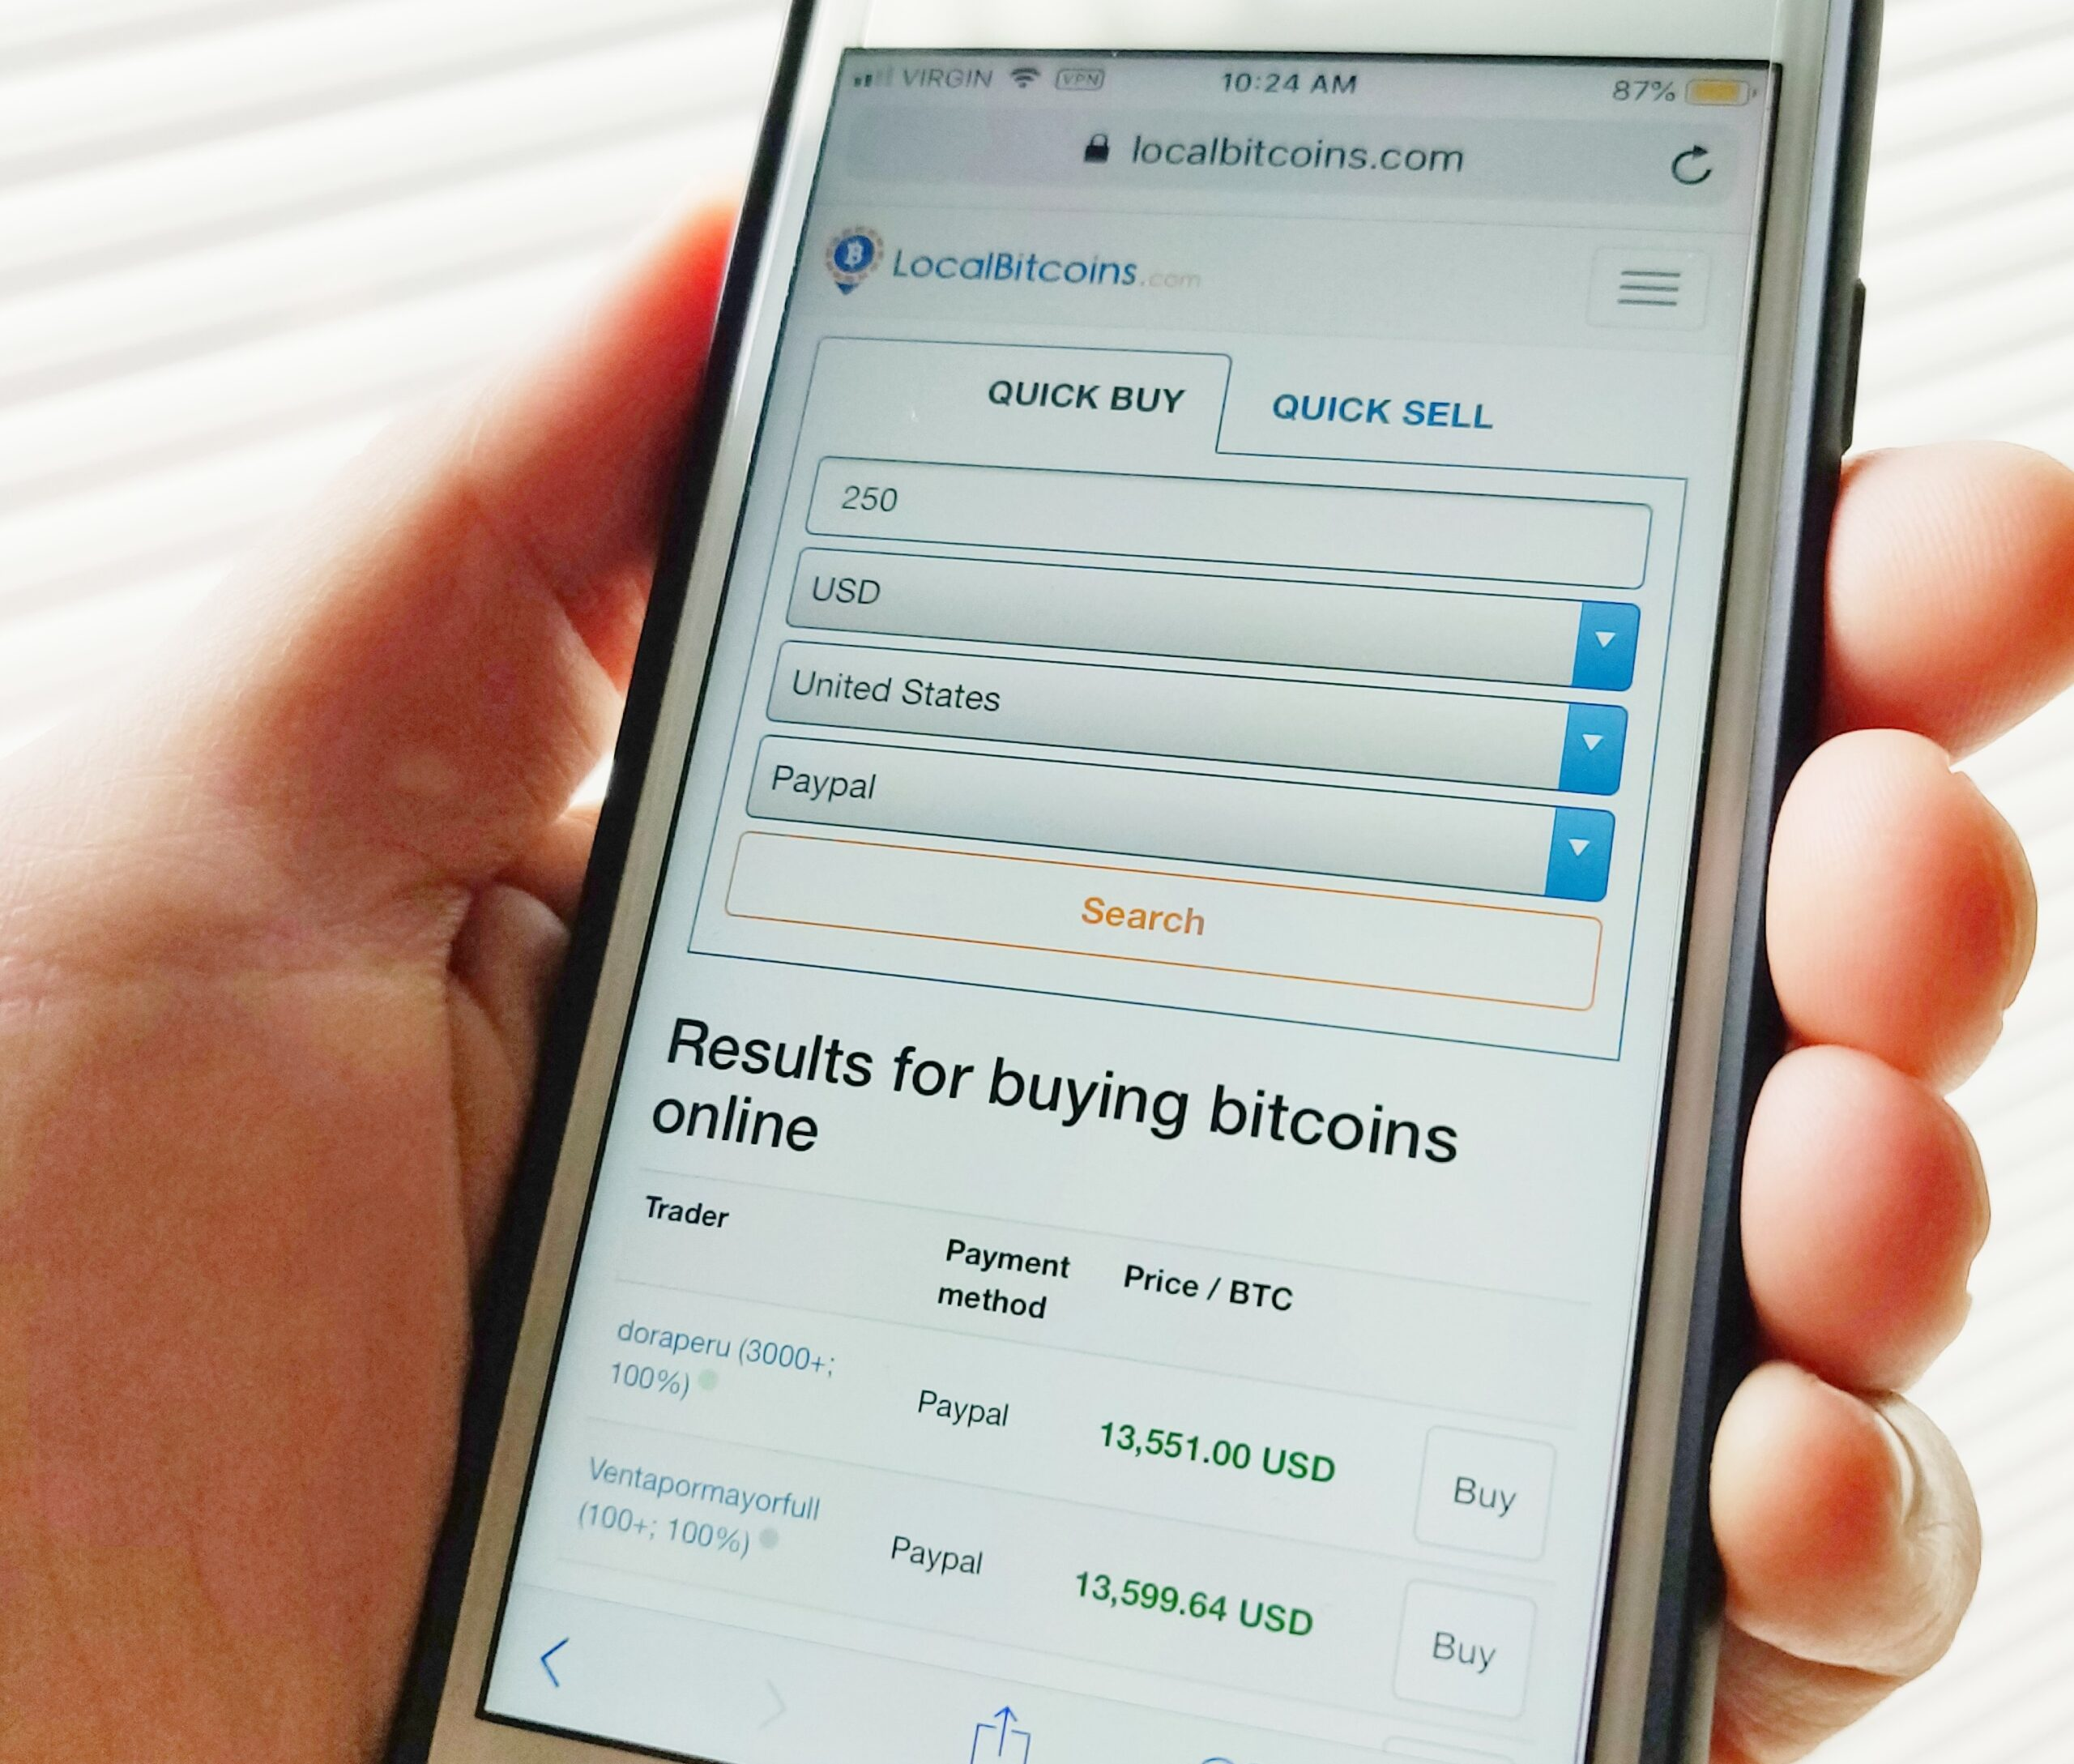 Online ipl betting websites paypal como minar bitcoins solo